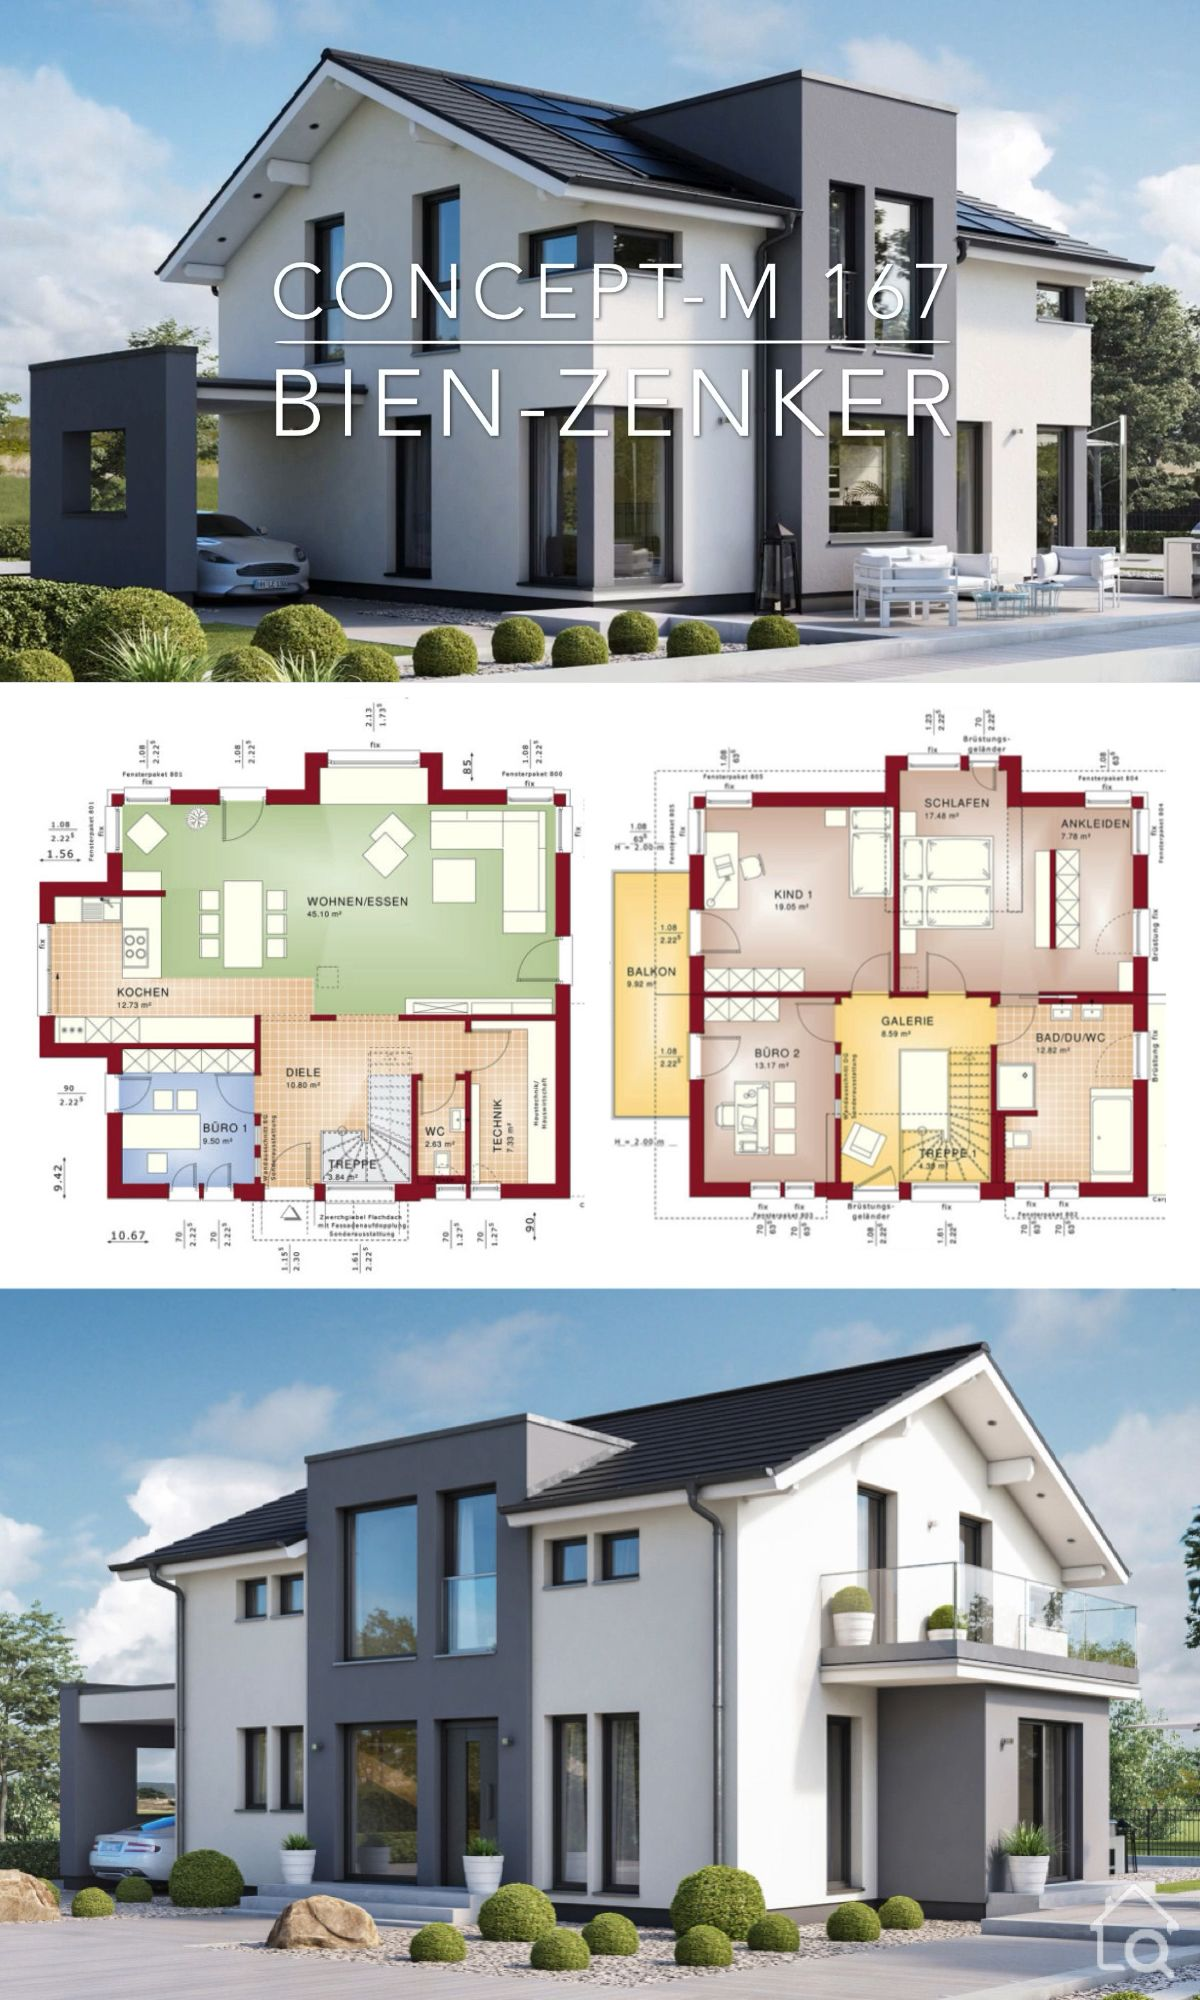 Photo of Modern House Plan Architecture Design – Concept-M 167